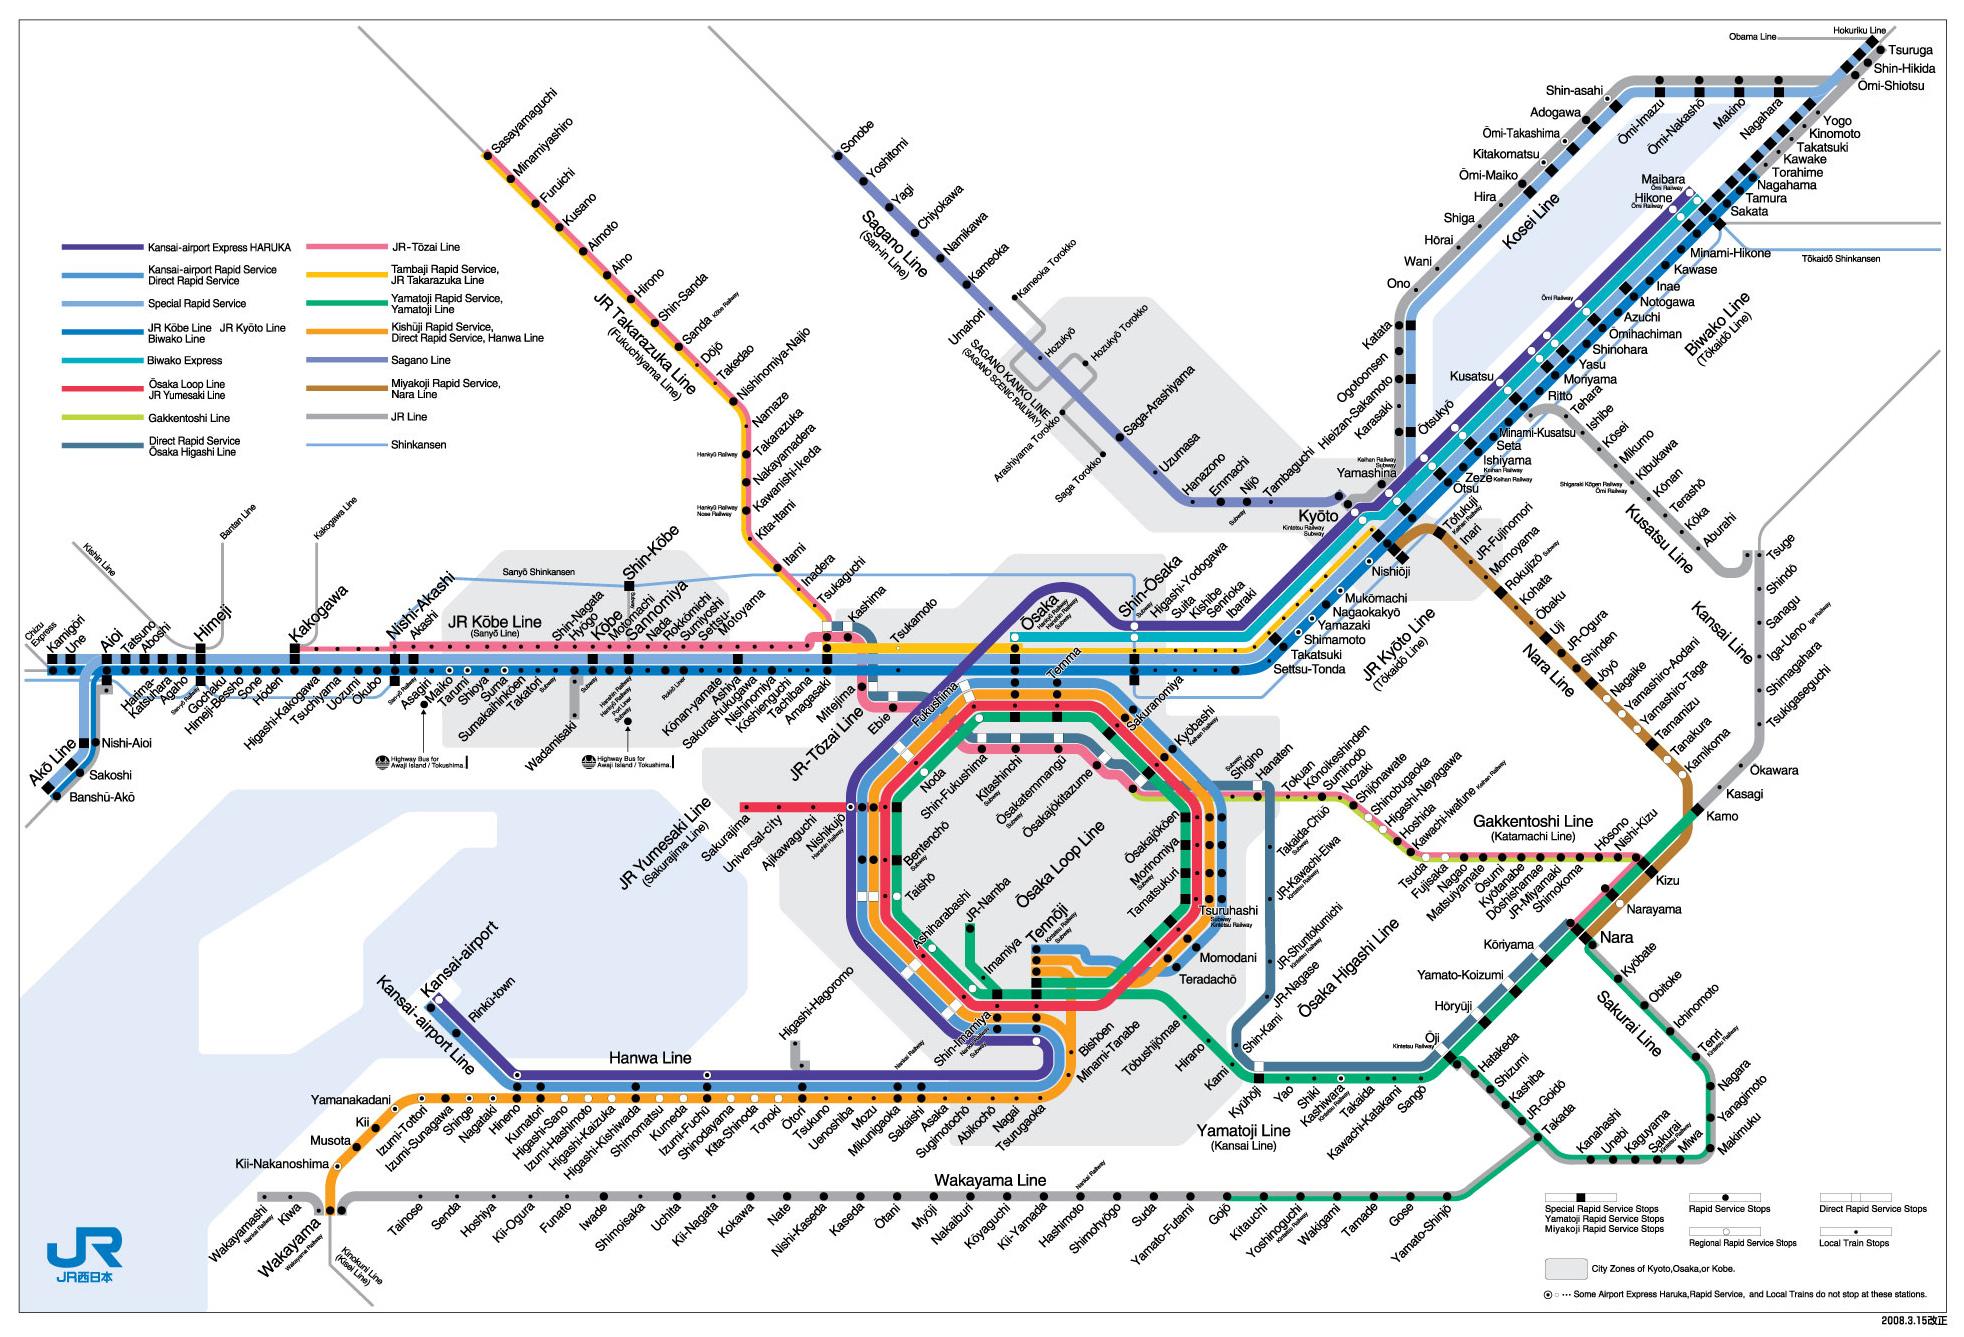 Osaka Travel Guide - Japan map travel guide